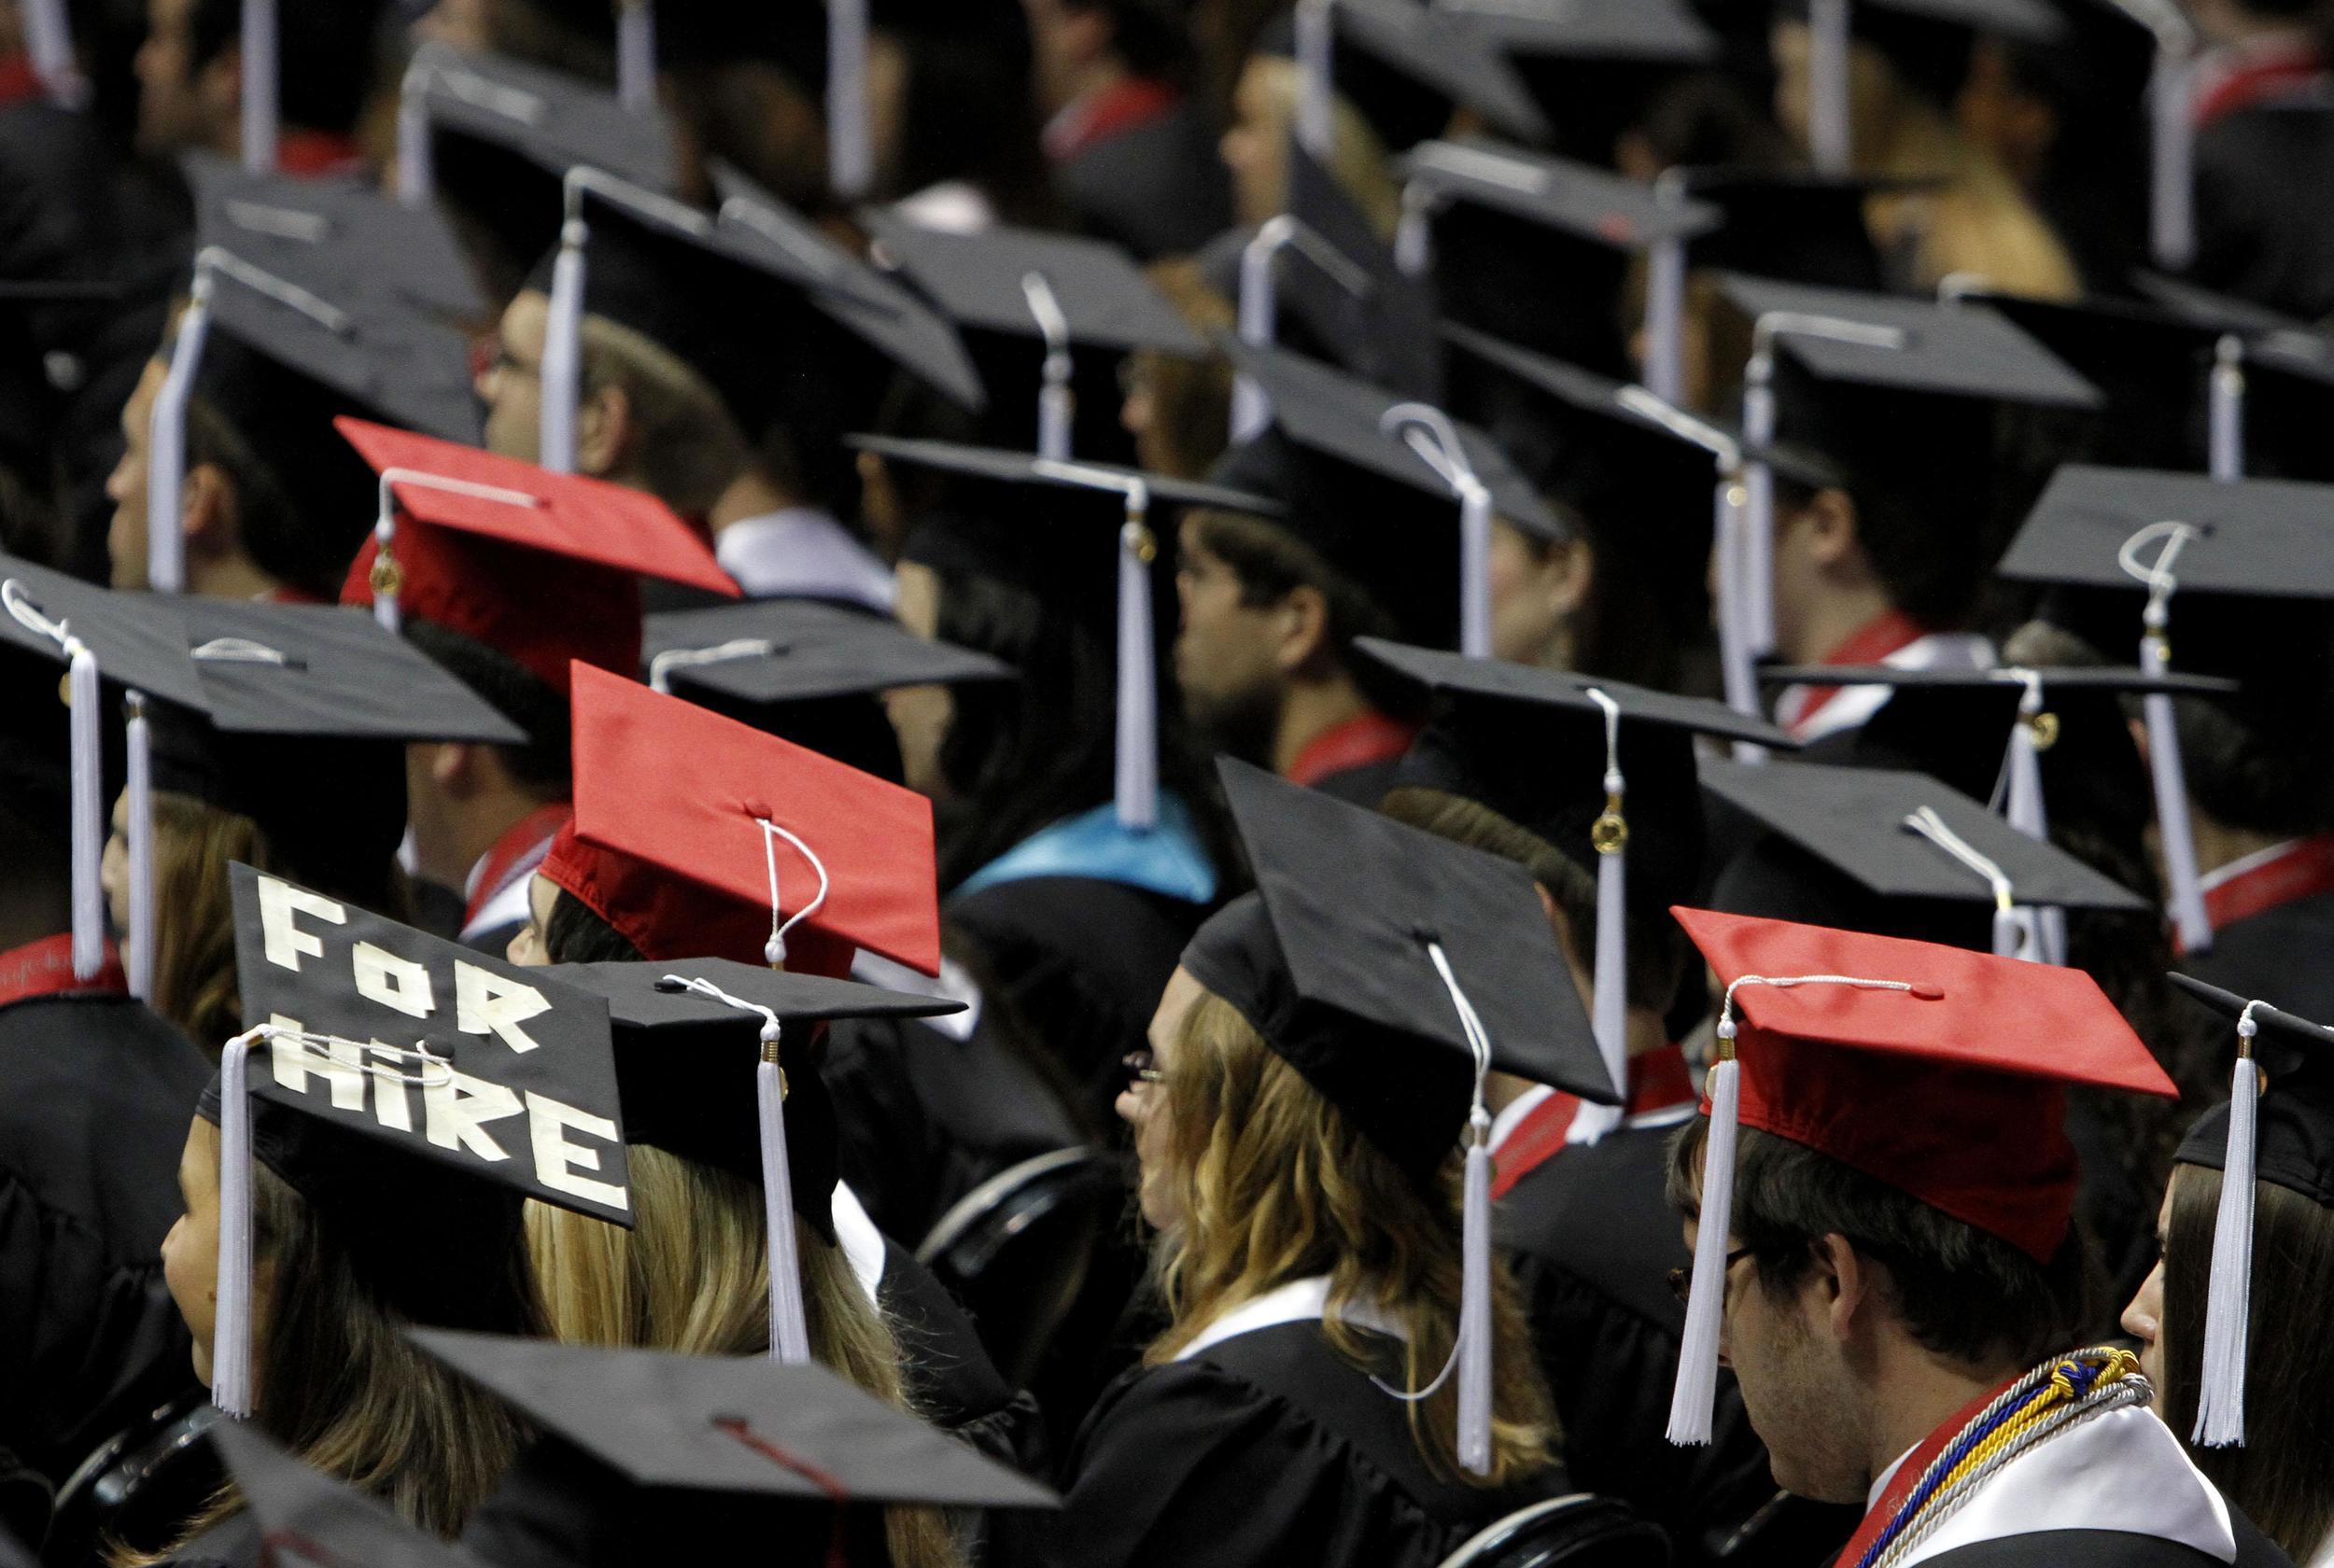 college_graduates_for_hire_791b5da614ffaa172cc2f8f57ccf048f.jpg